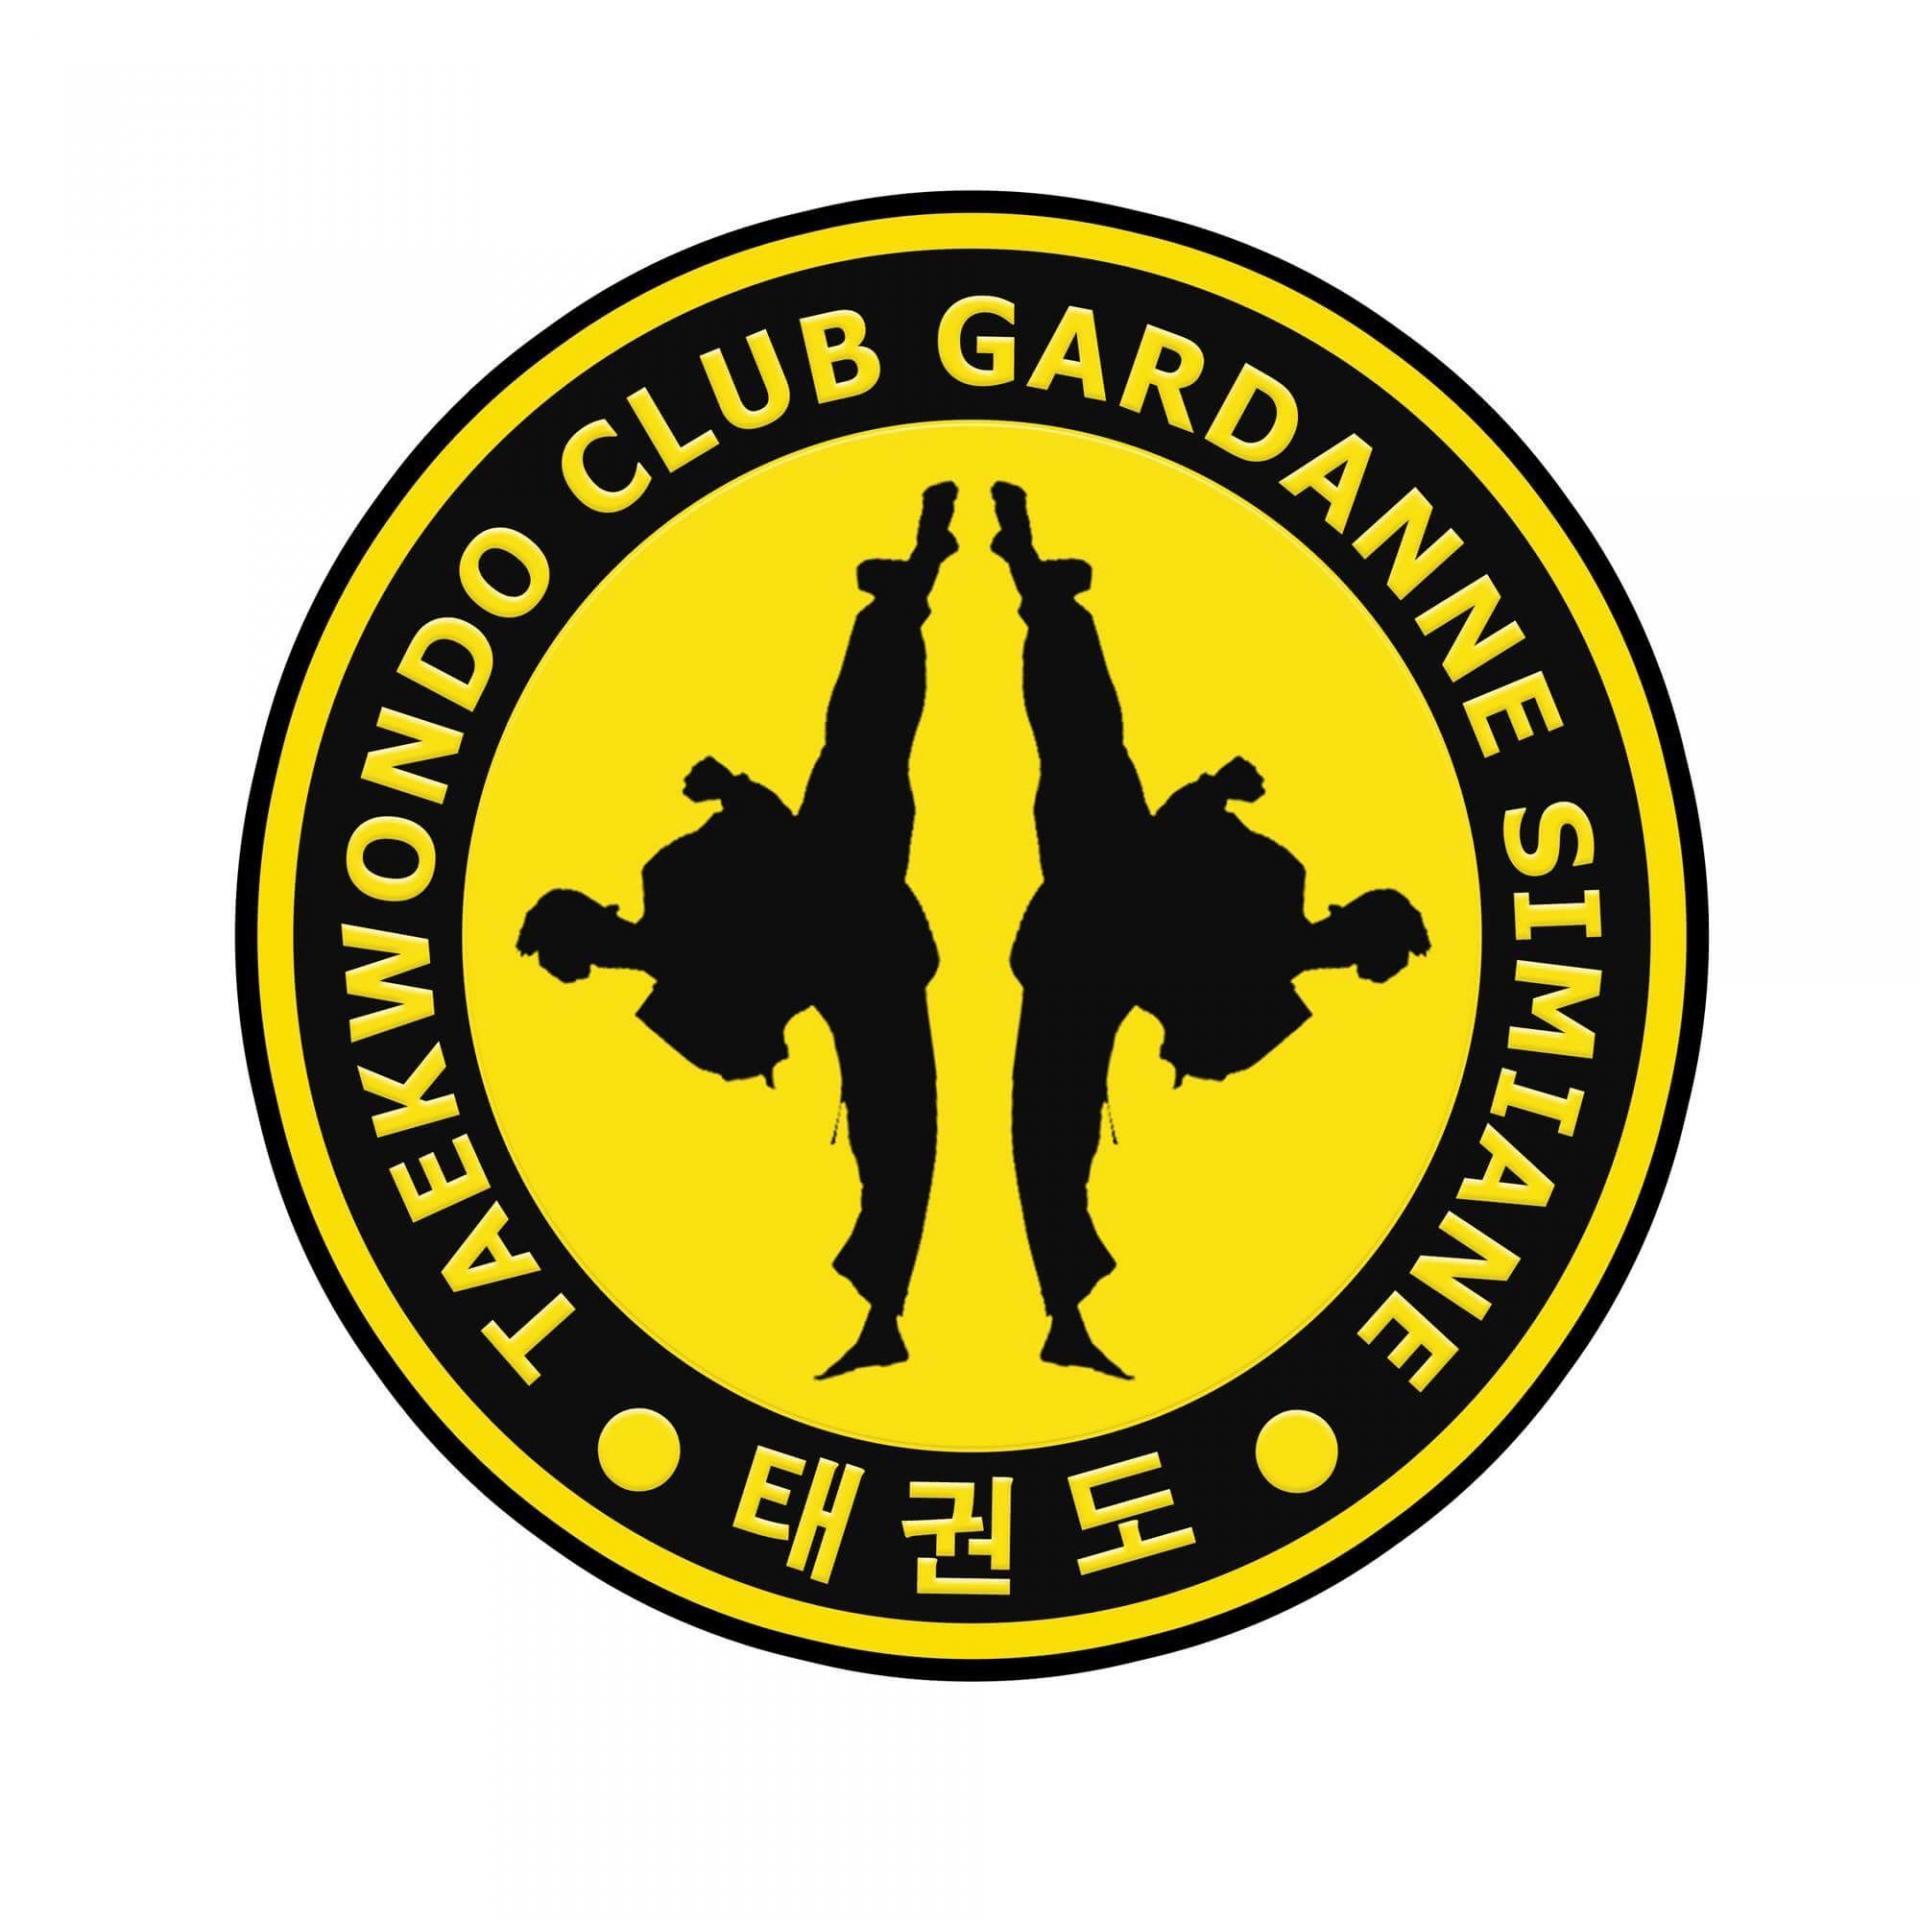 Taekwondo Club Gardanne/Simiane